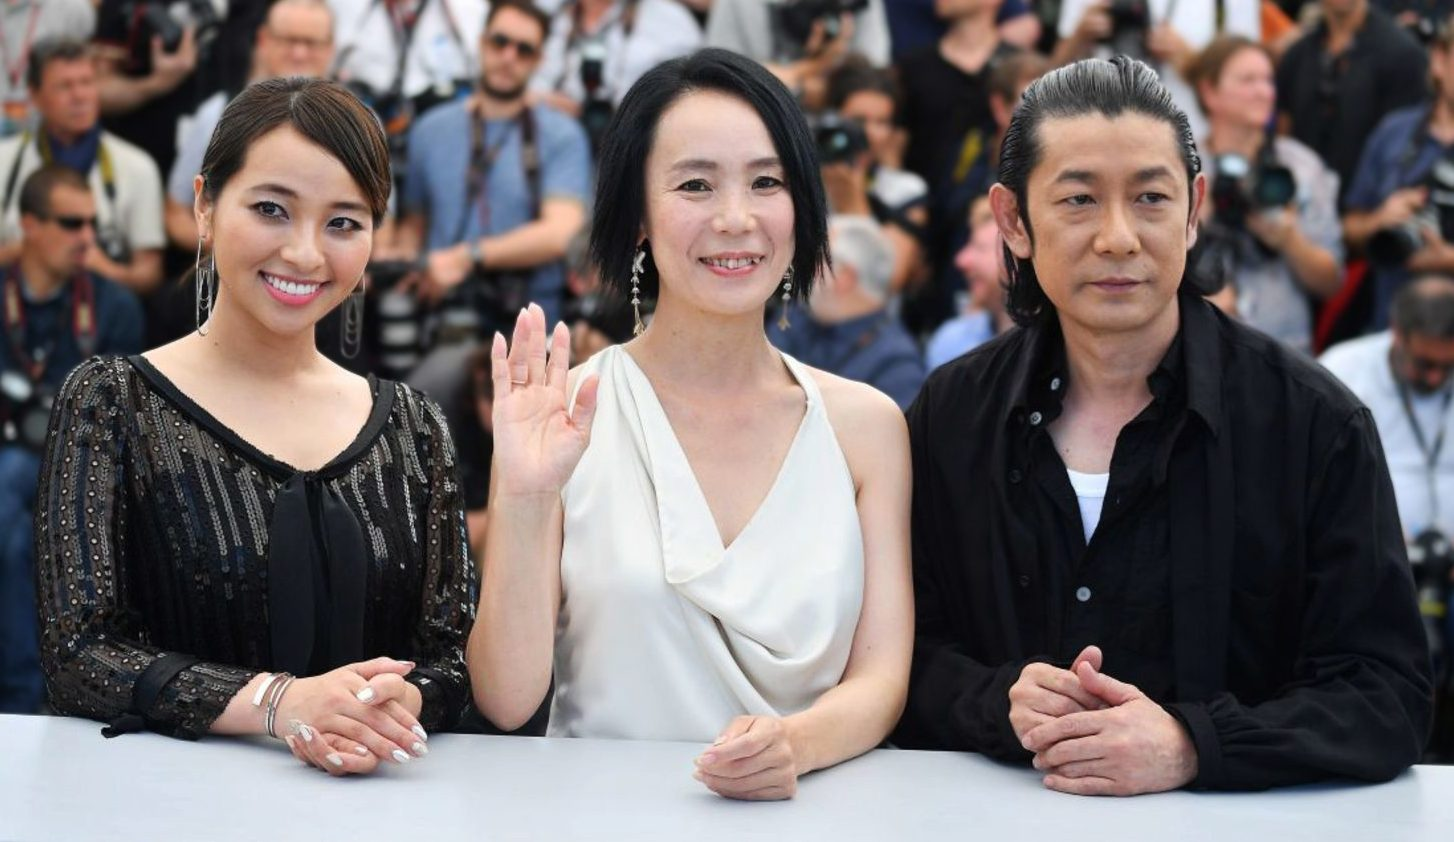 Ayame Misaki, Naomi Kawase and Masatoshi Nagase during Radiance Photocall at 2017 Cannes Film Festival